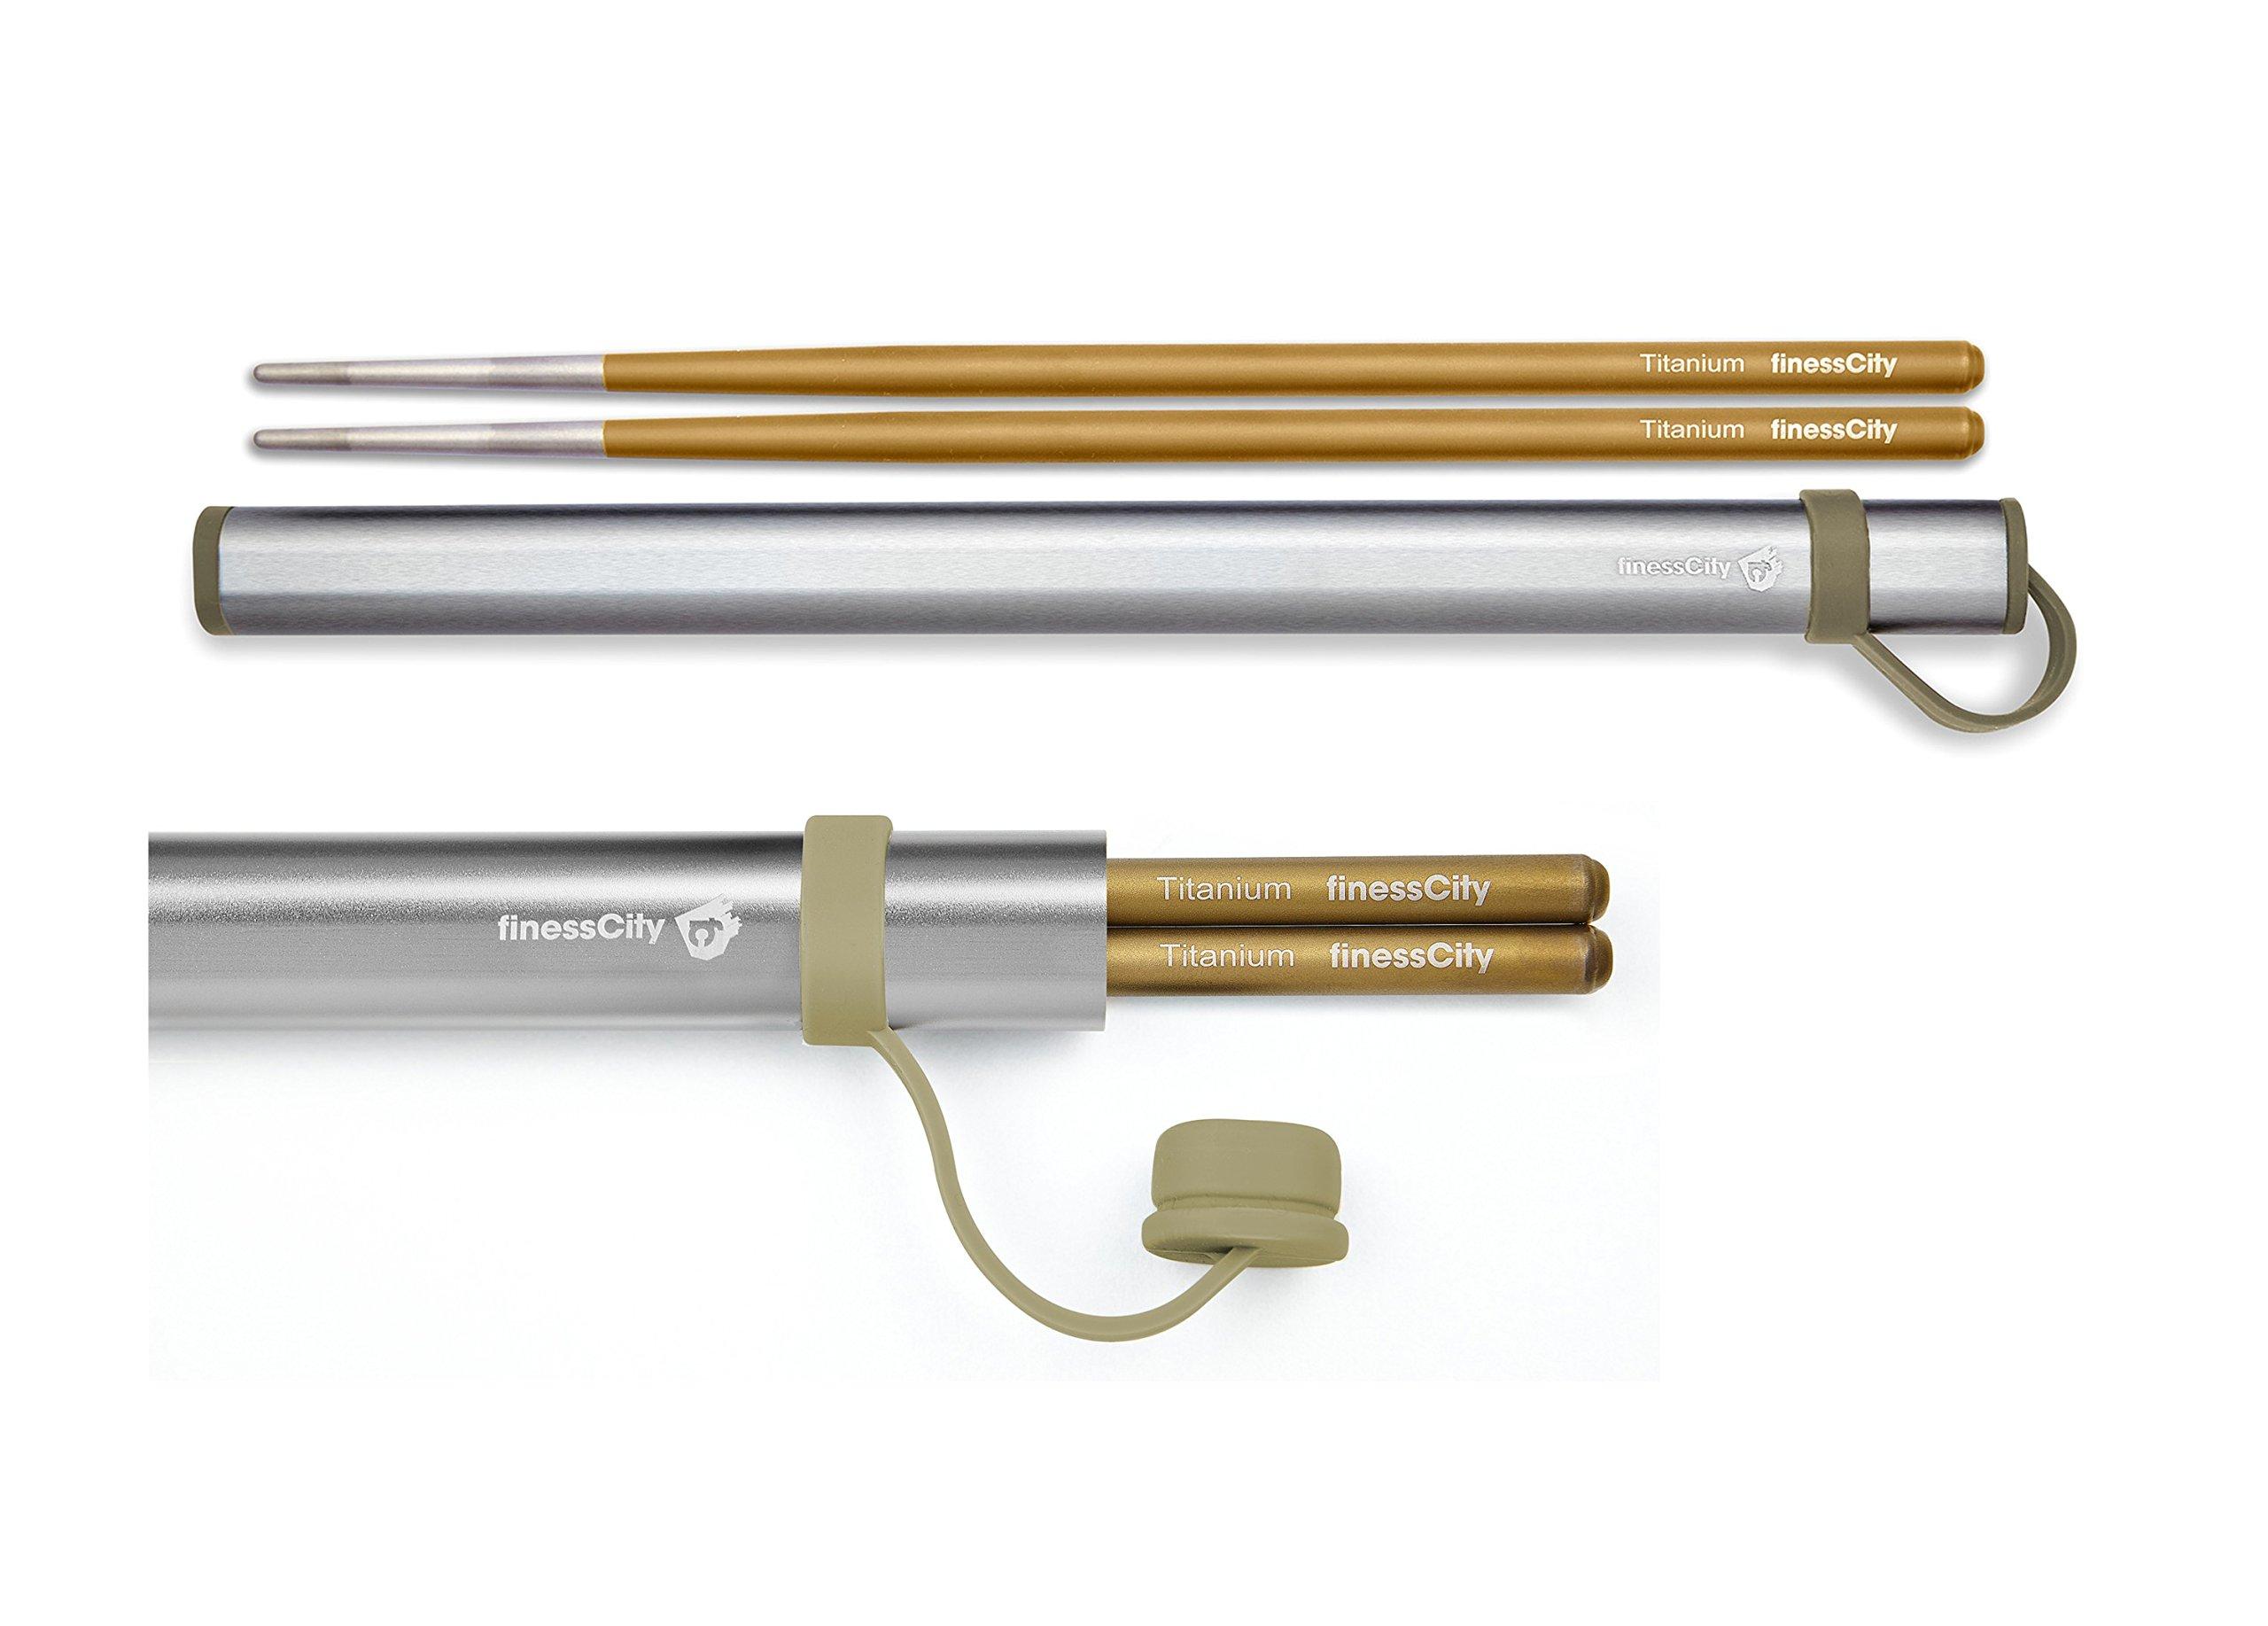 Chopsticks, 1 Pair of Titanium Chopsticks Ultra Lightweight Professional (Ti), Super Strong Healthy and Eco-Friendly 1 Pair of Chopsticks Comes with Free Aluminium Case (Golden)